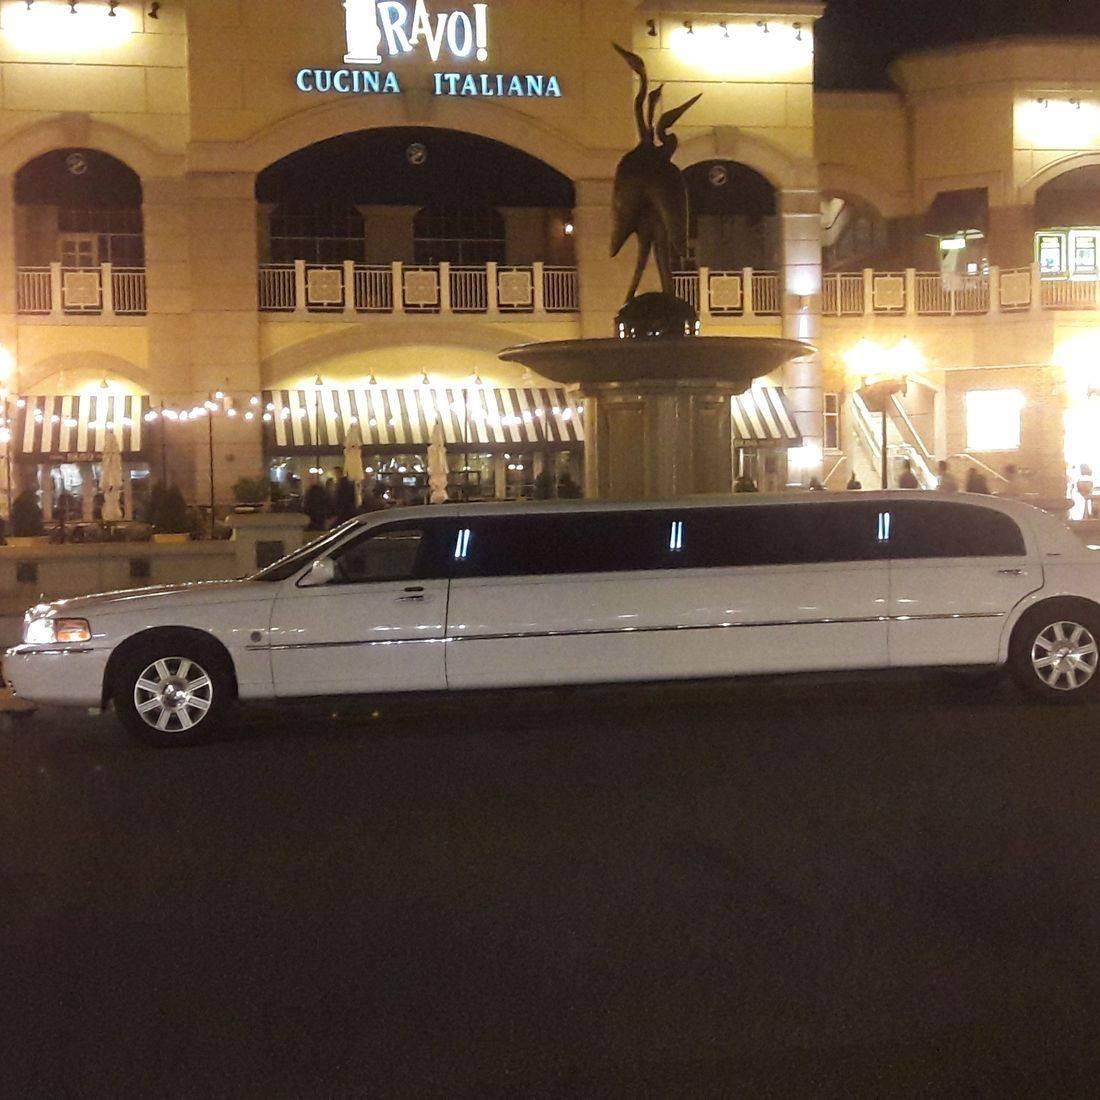 Pleasure cruise event